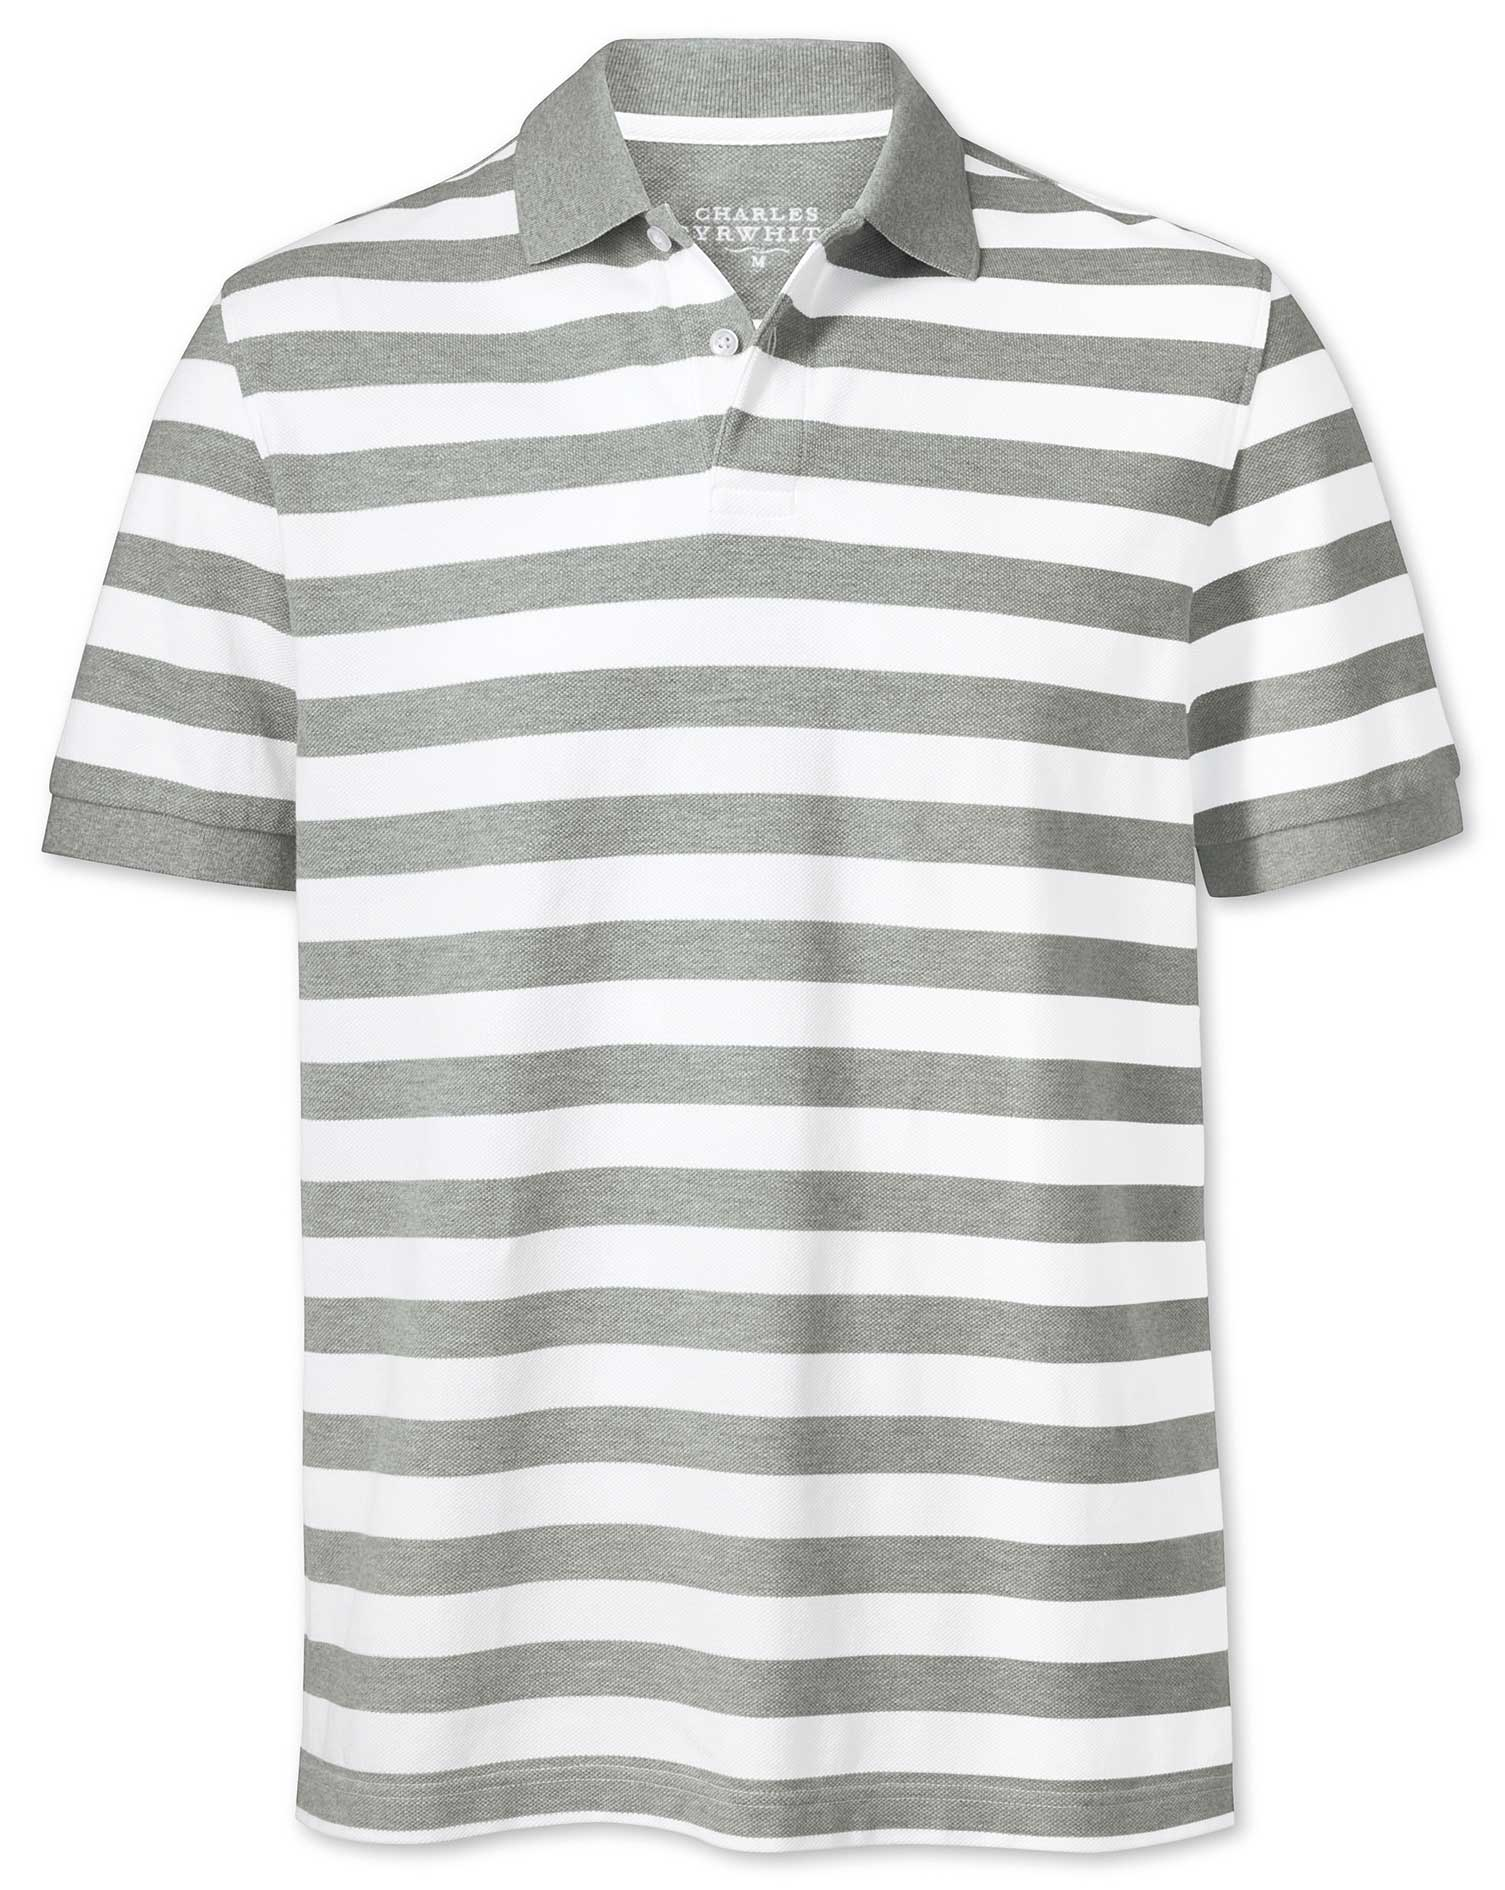 Grey and White Stripe Pique Cotton Polo Size XL by Charles Tyrwhitt